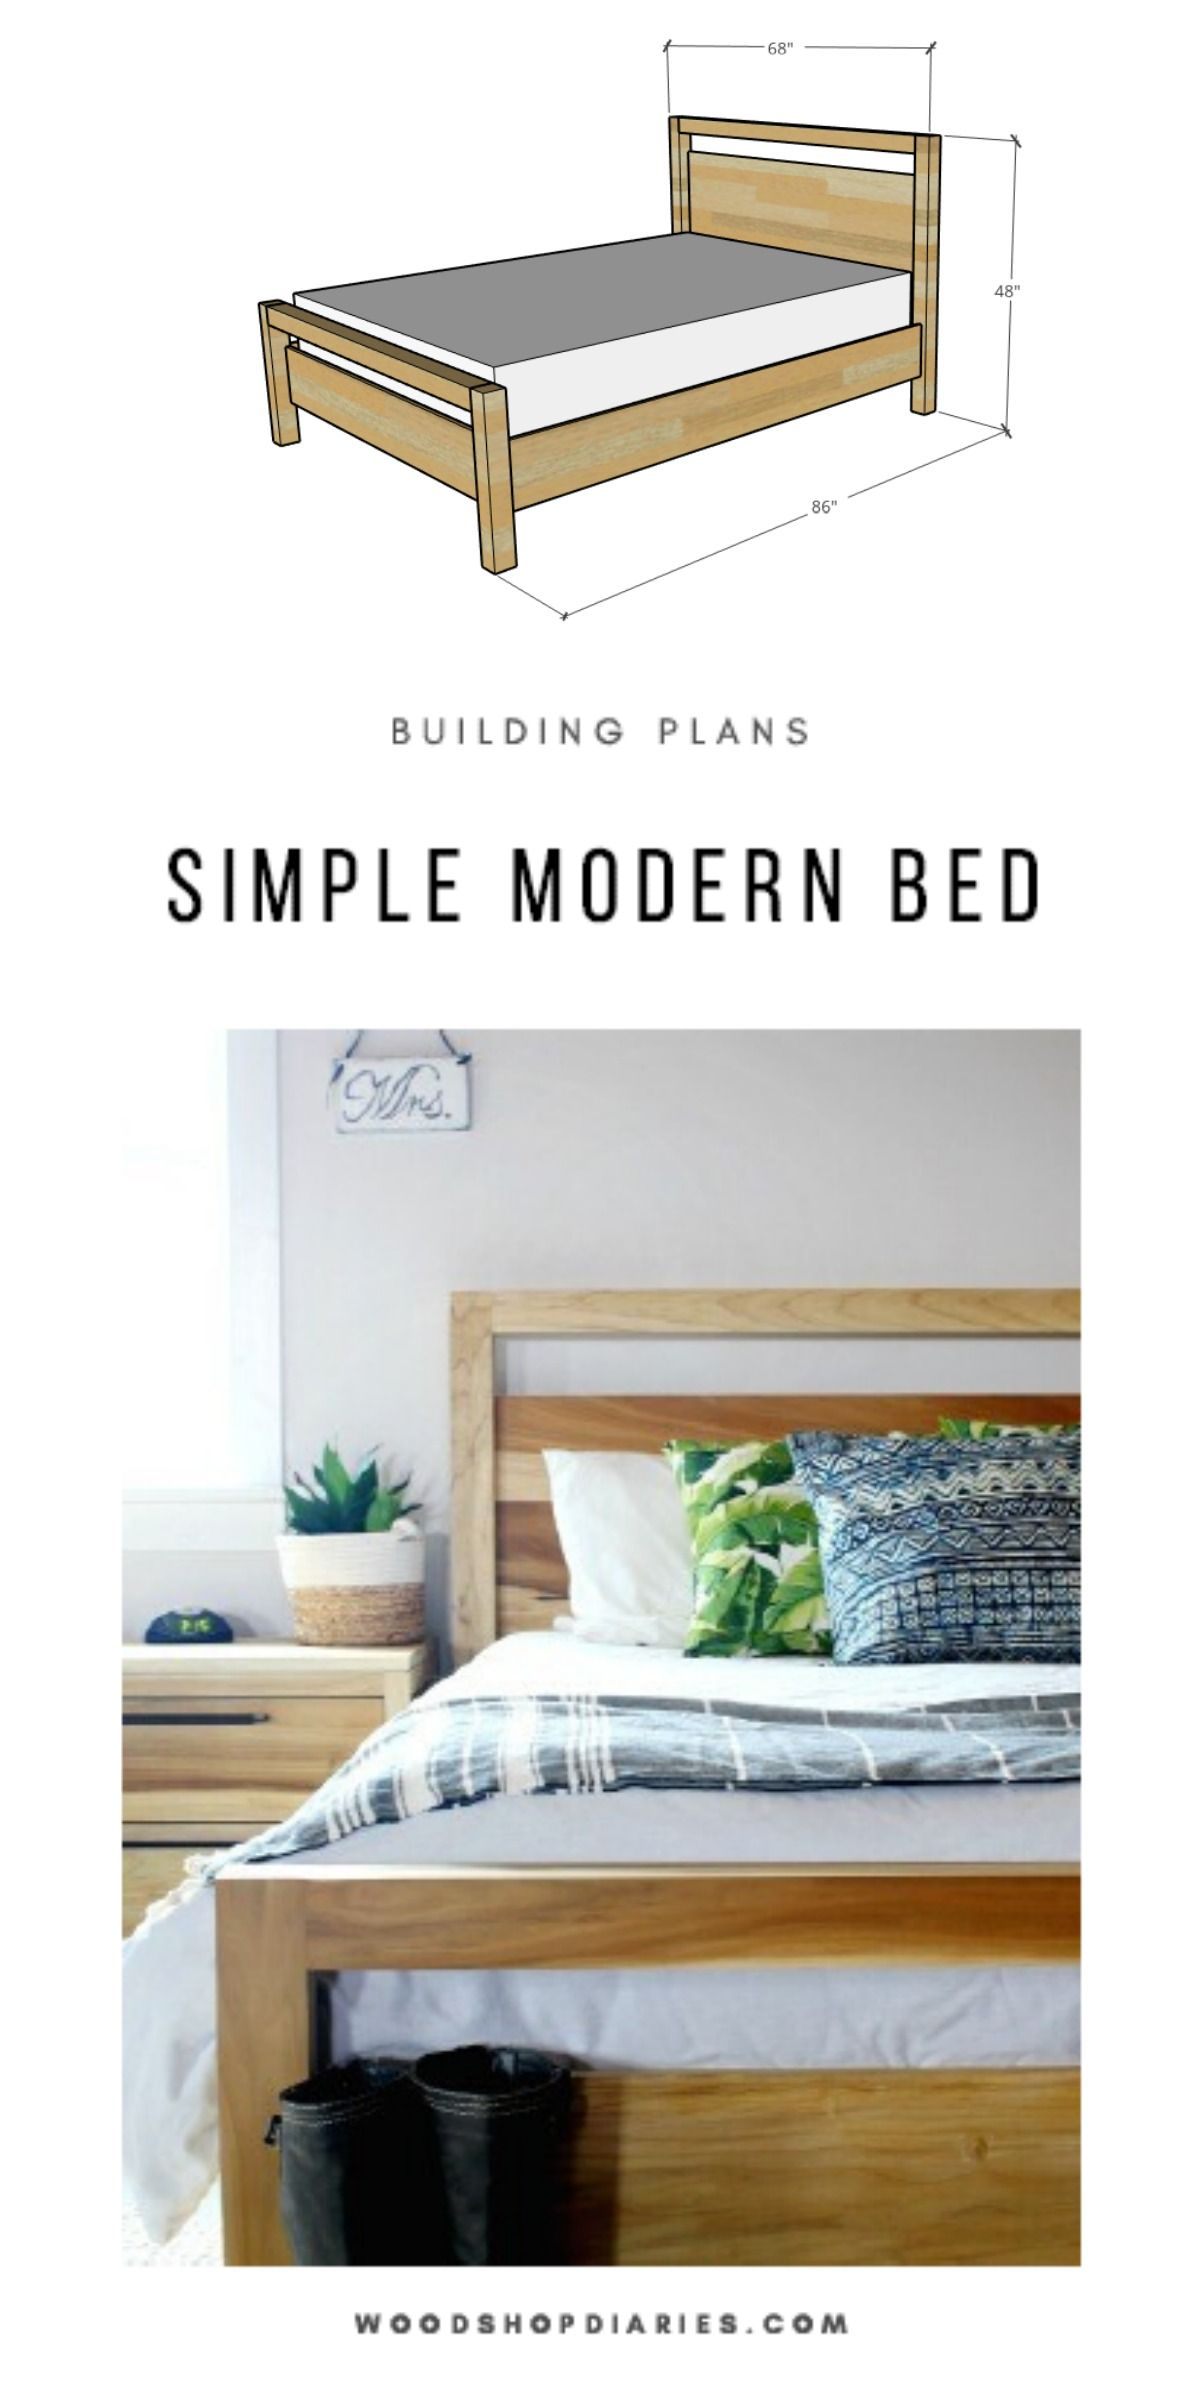 Modern Diy Bed Frame How To Build A Bed In 7 Easy Steps Simple Bed Frame Diy Modern Bed Bed Frame Design